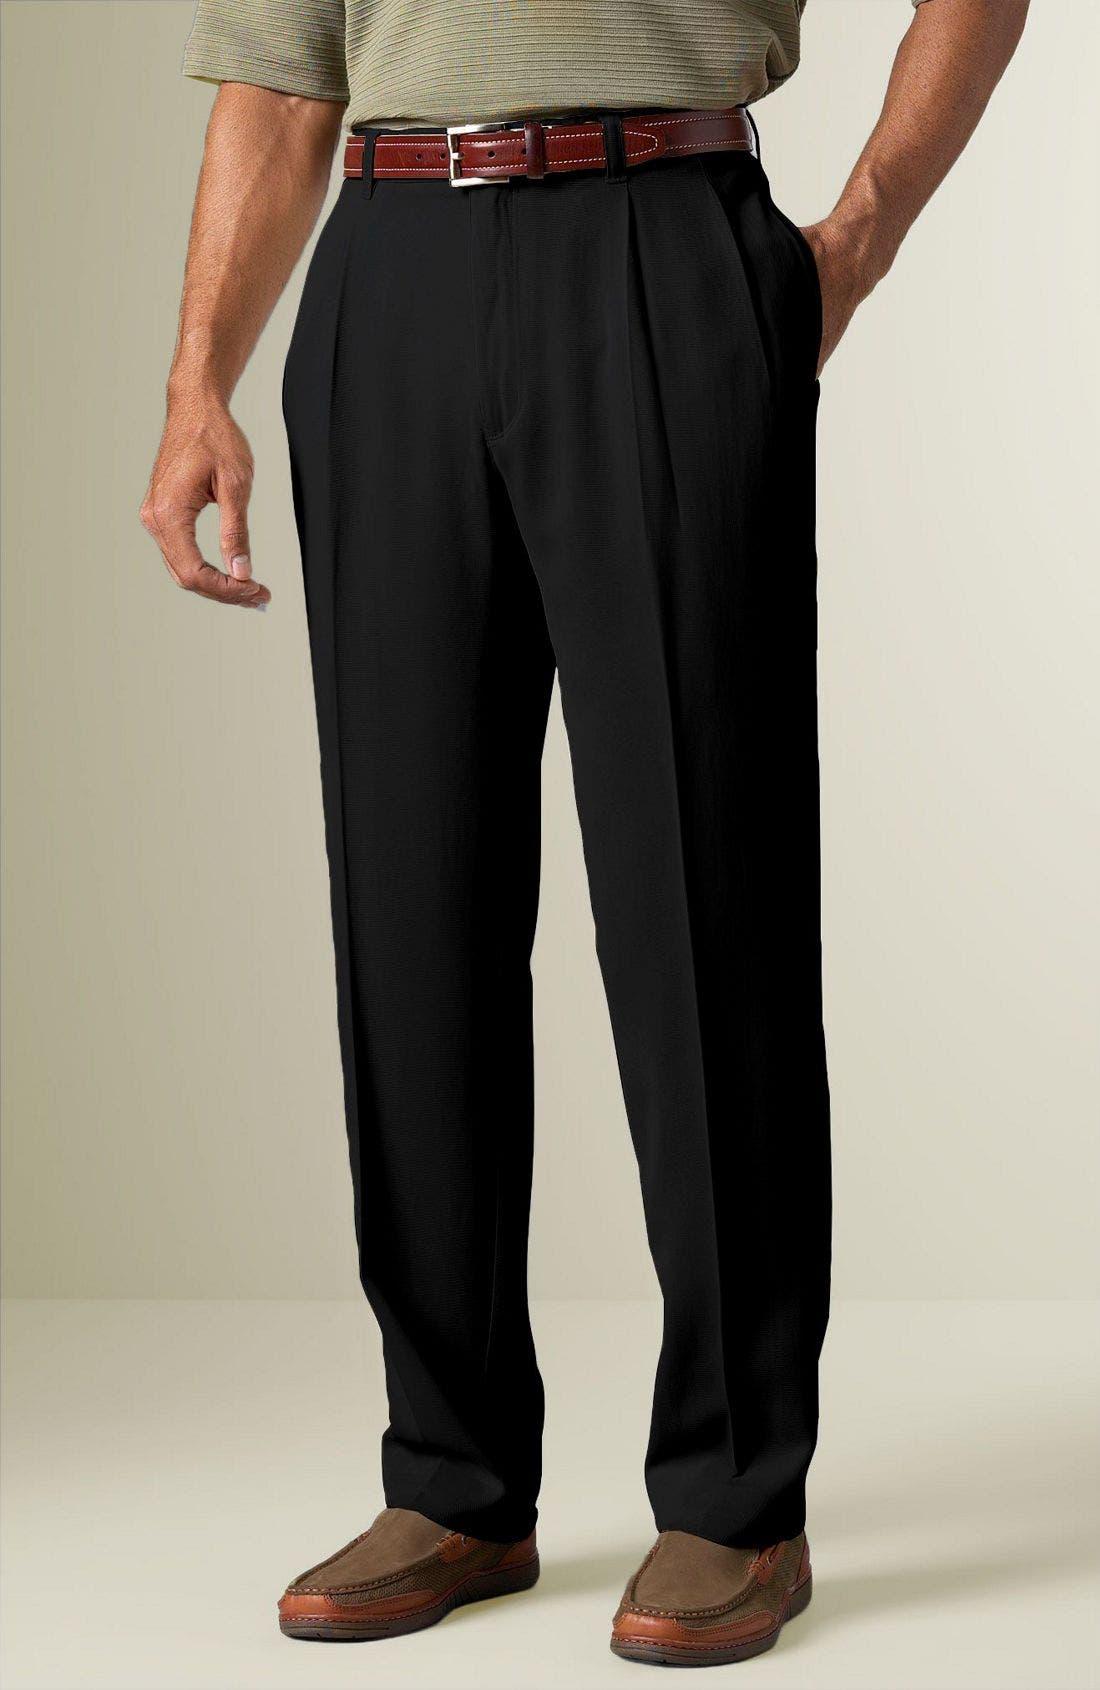 TOMMY BAHAMA 'St. Thomas' Pants, Main, color, BLK